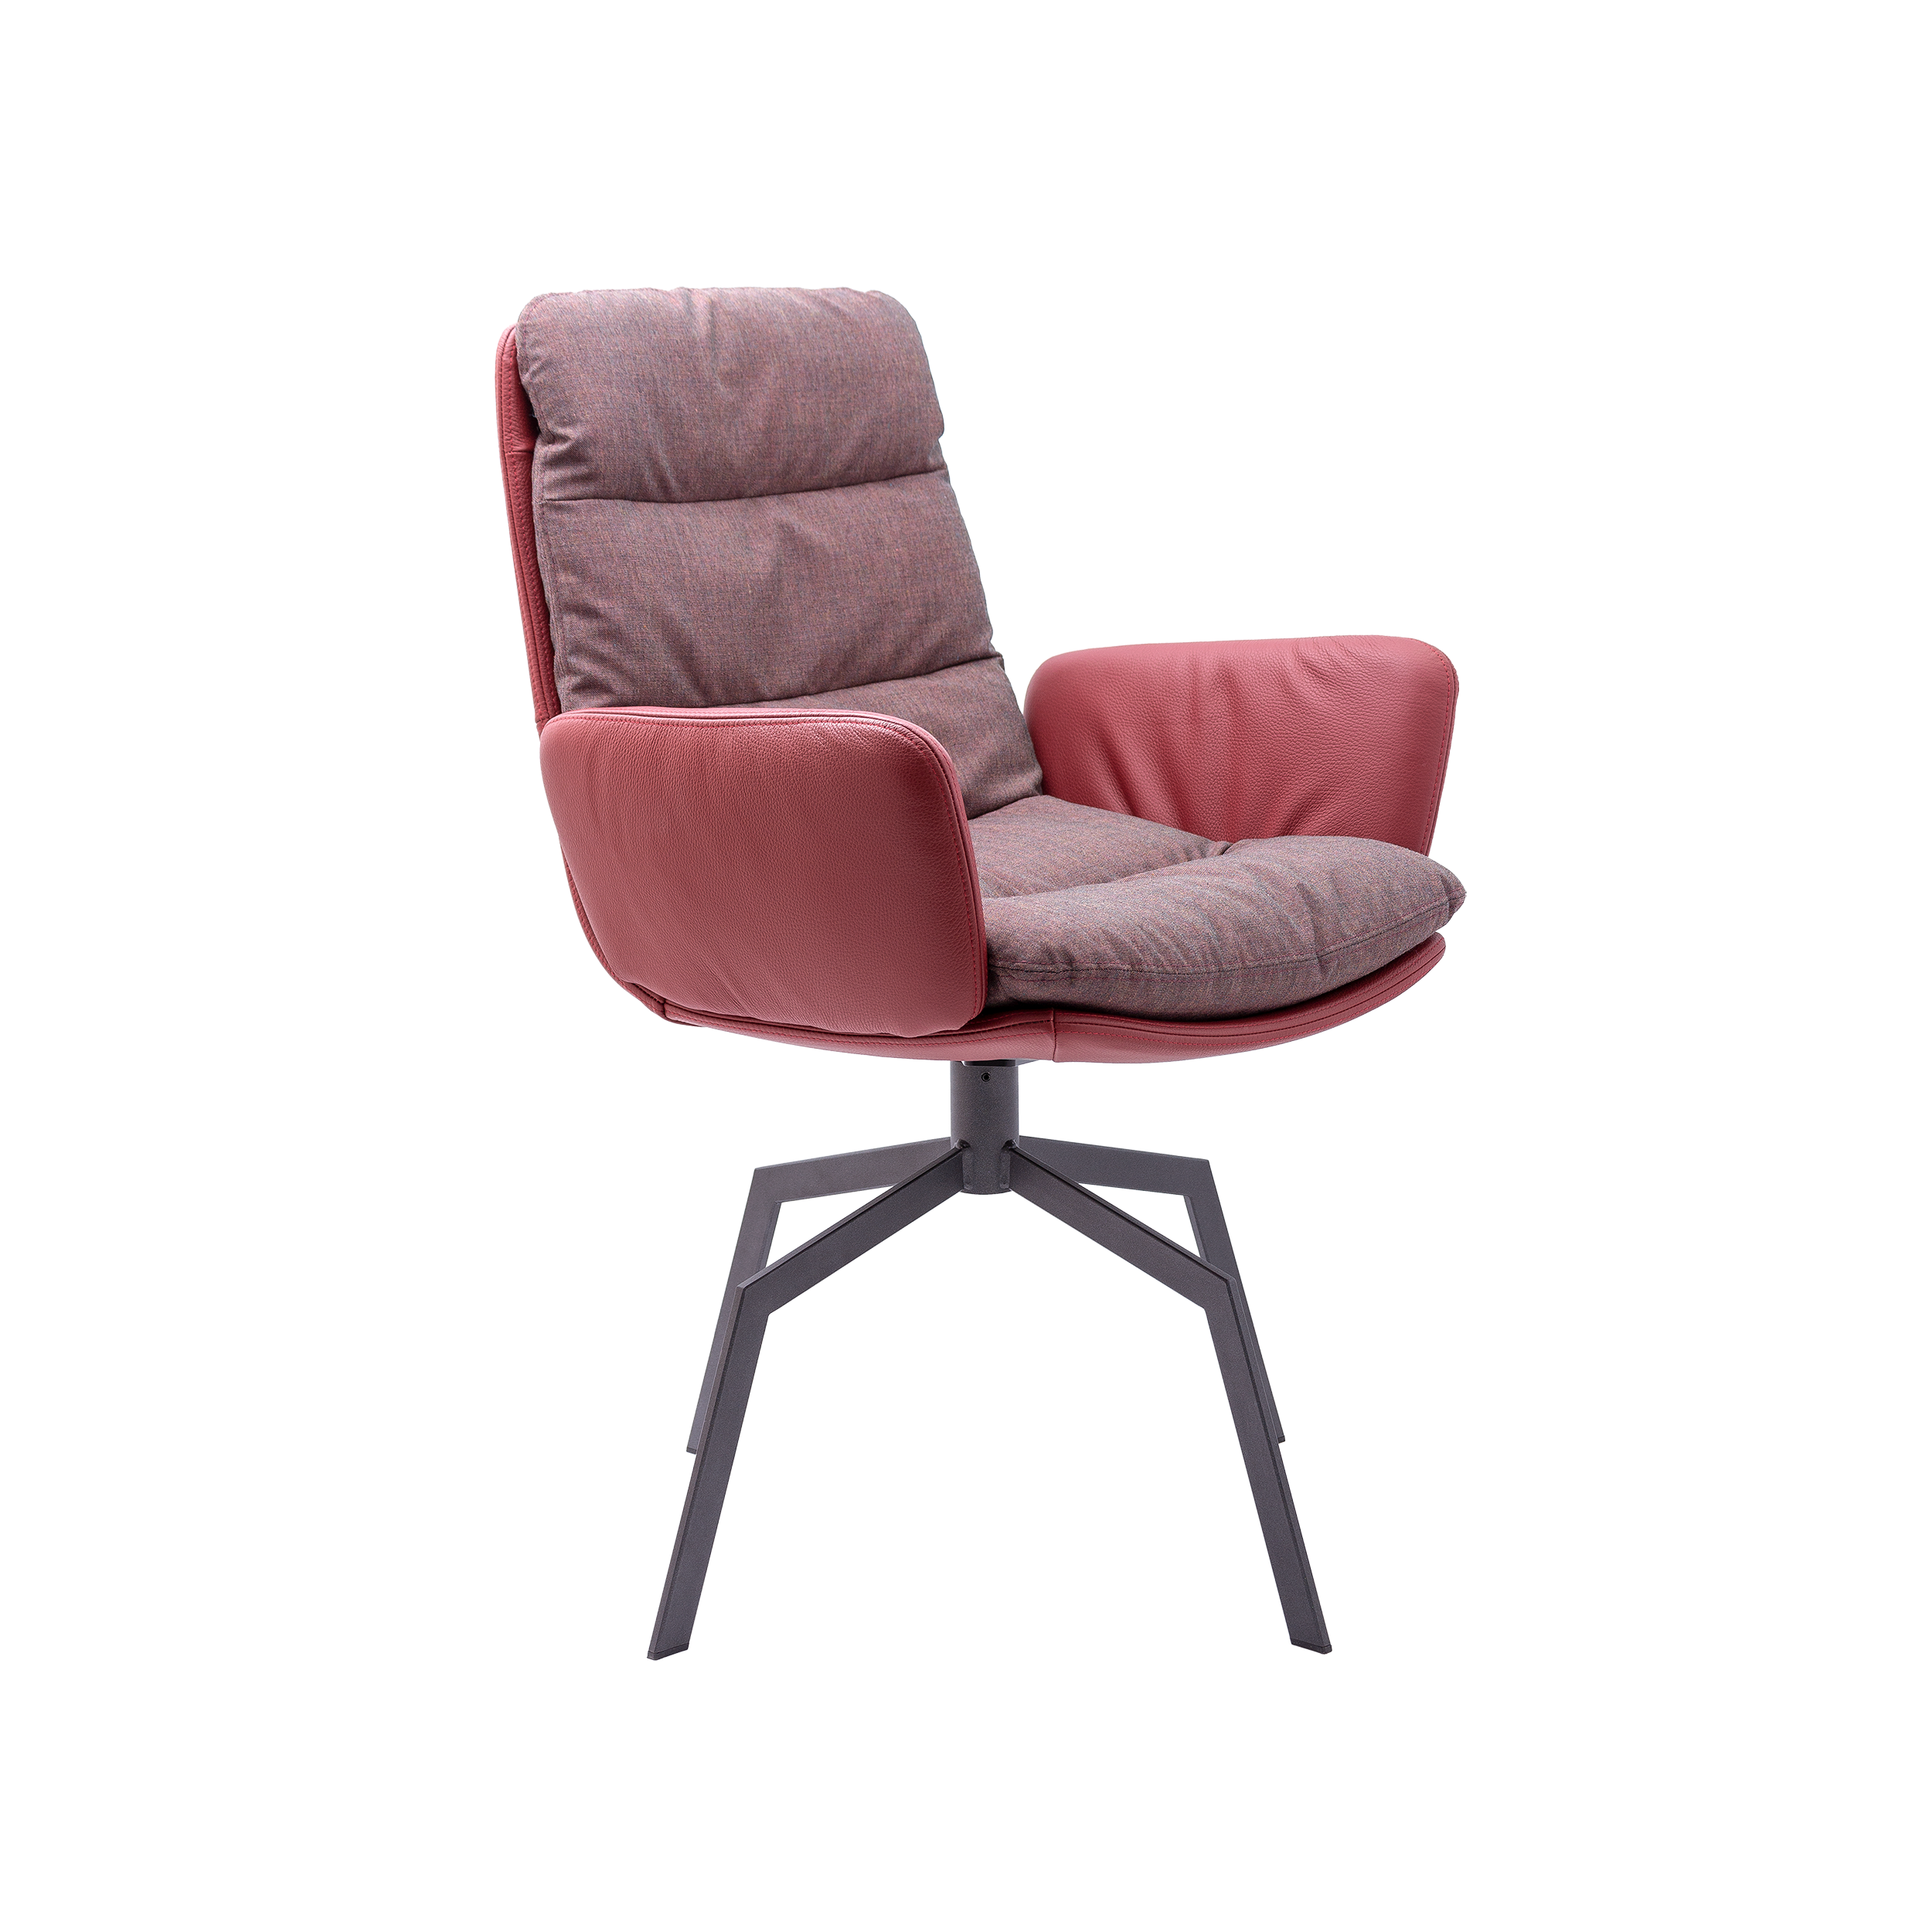 Kff Arva Chair Designed By Kff Dining Arva Stuhl Designed By